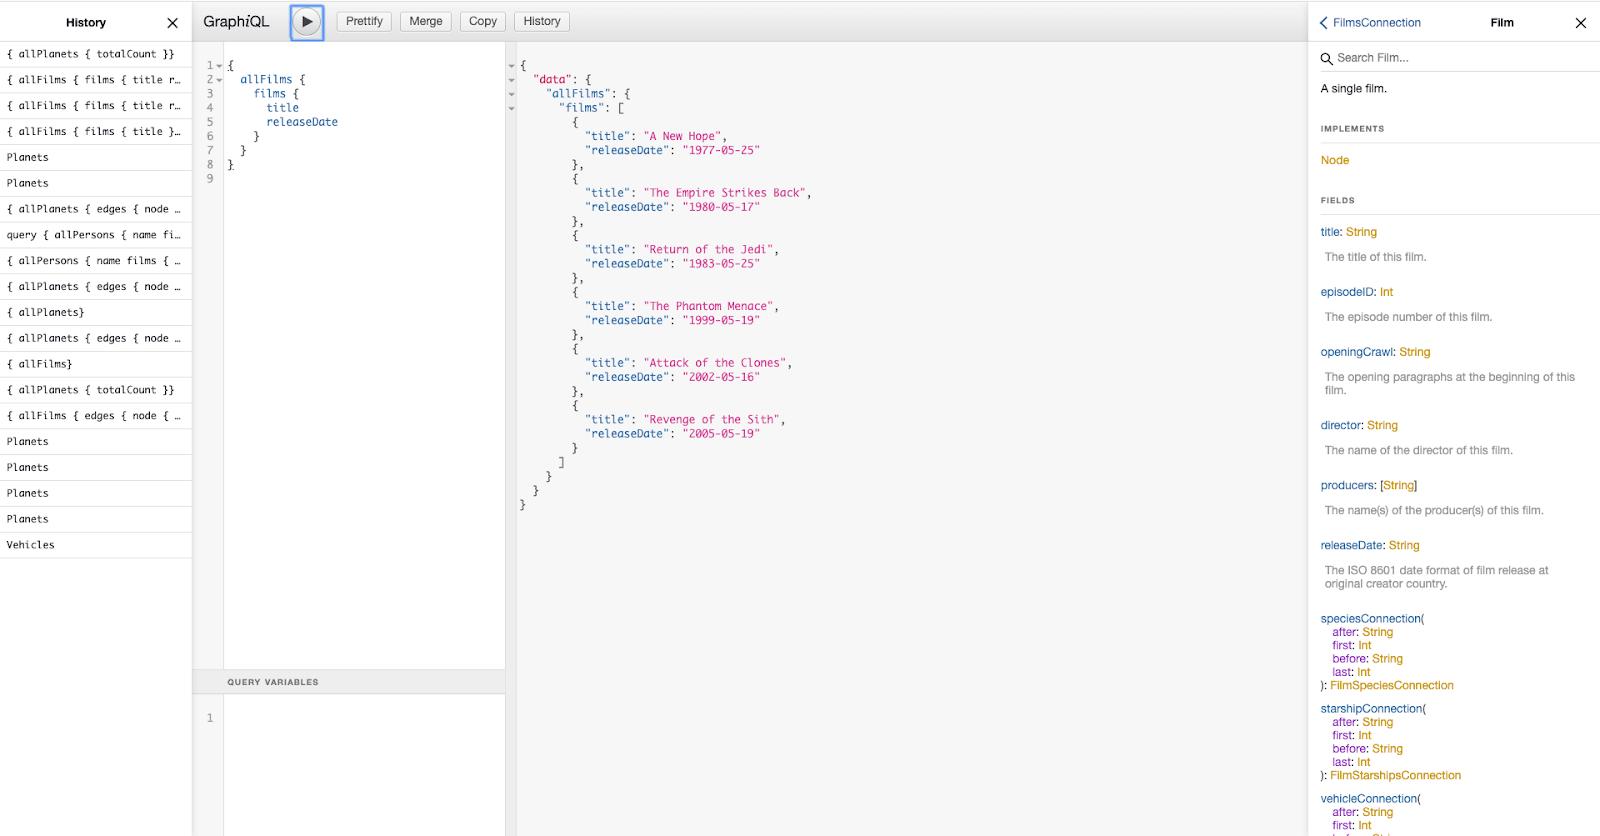 Retool-GraphQL-IDE-Image-1